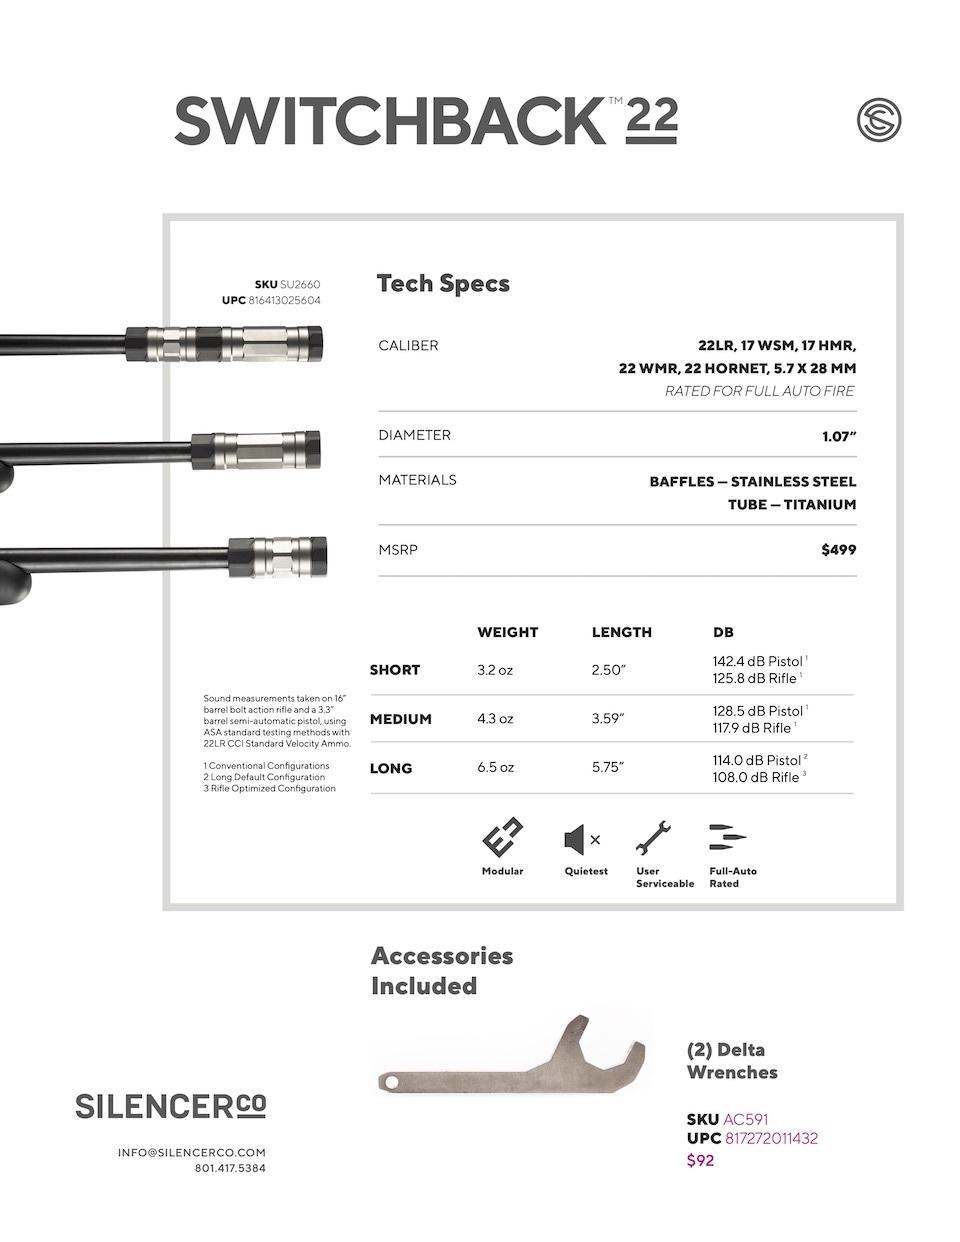 Switchback 22 Suppressor specs